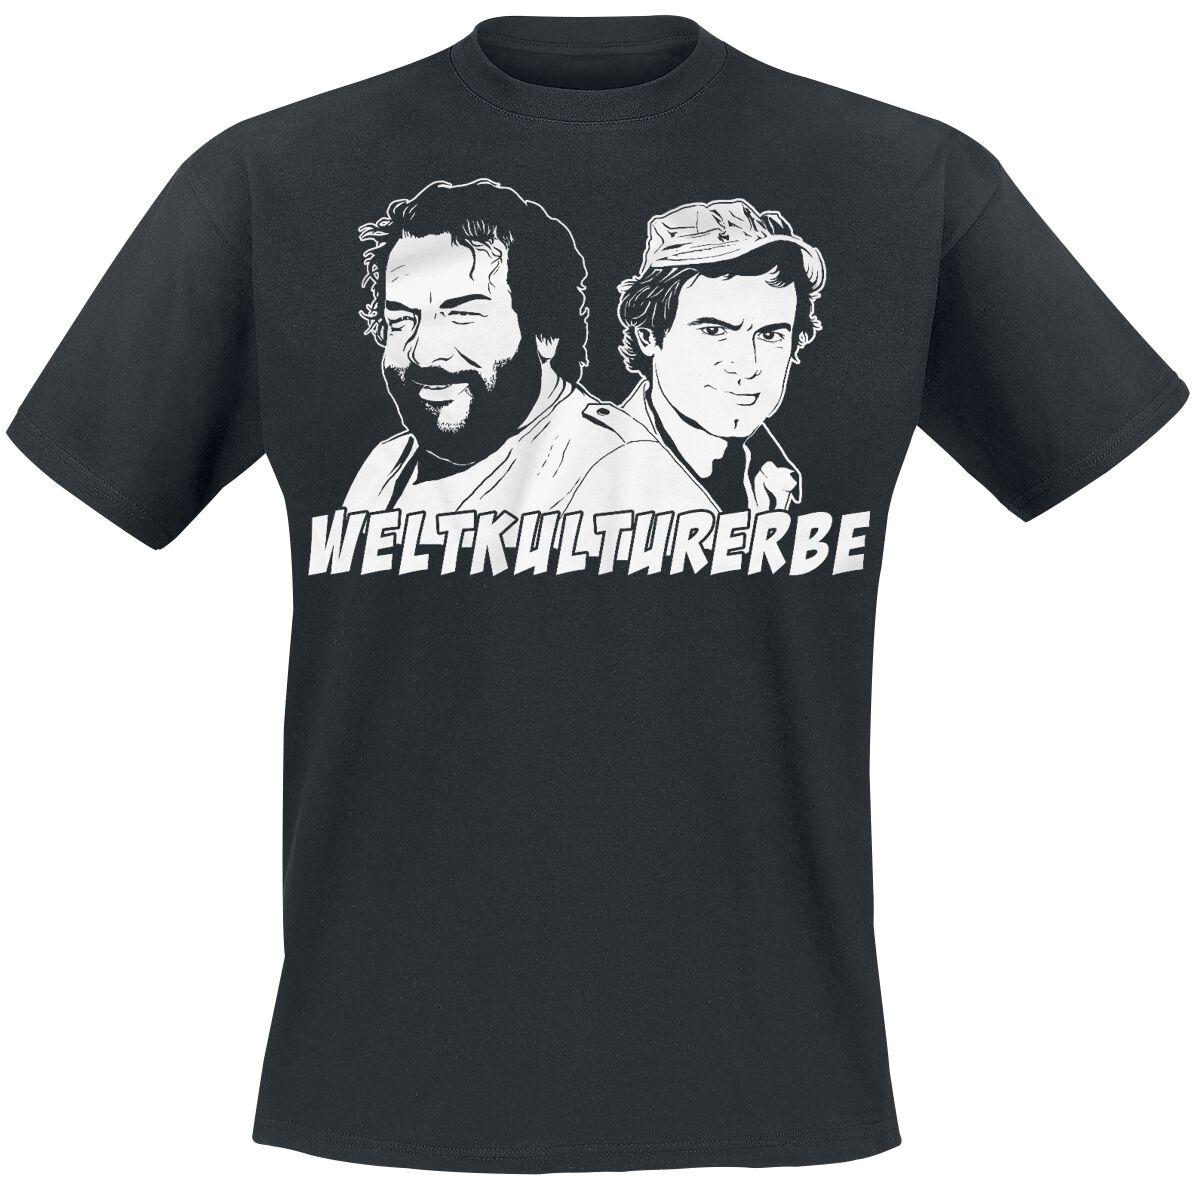 Merch dla Fanów - Koszulki - T-Shirt Bud Spencer Weltkulturerbe T-Shirt czarny - 359674